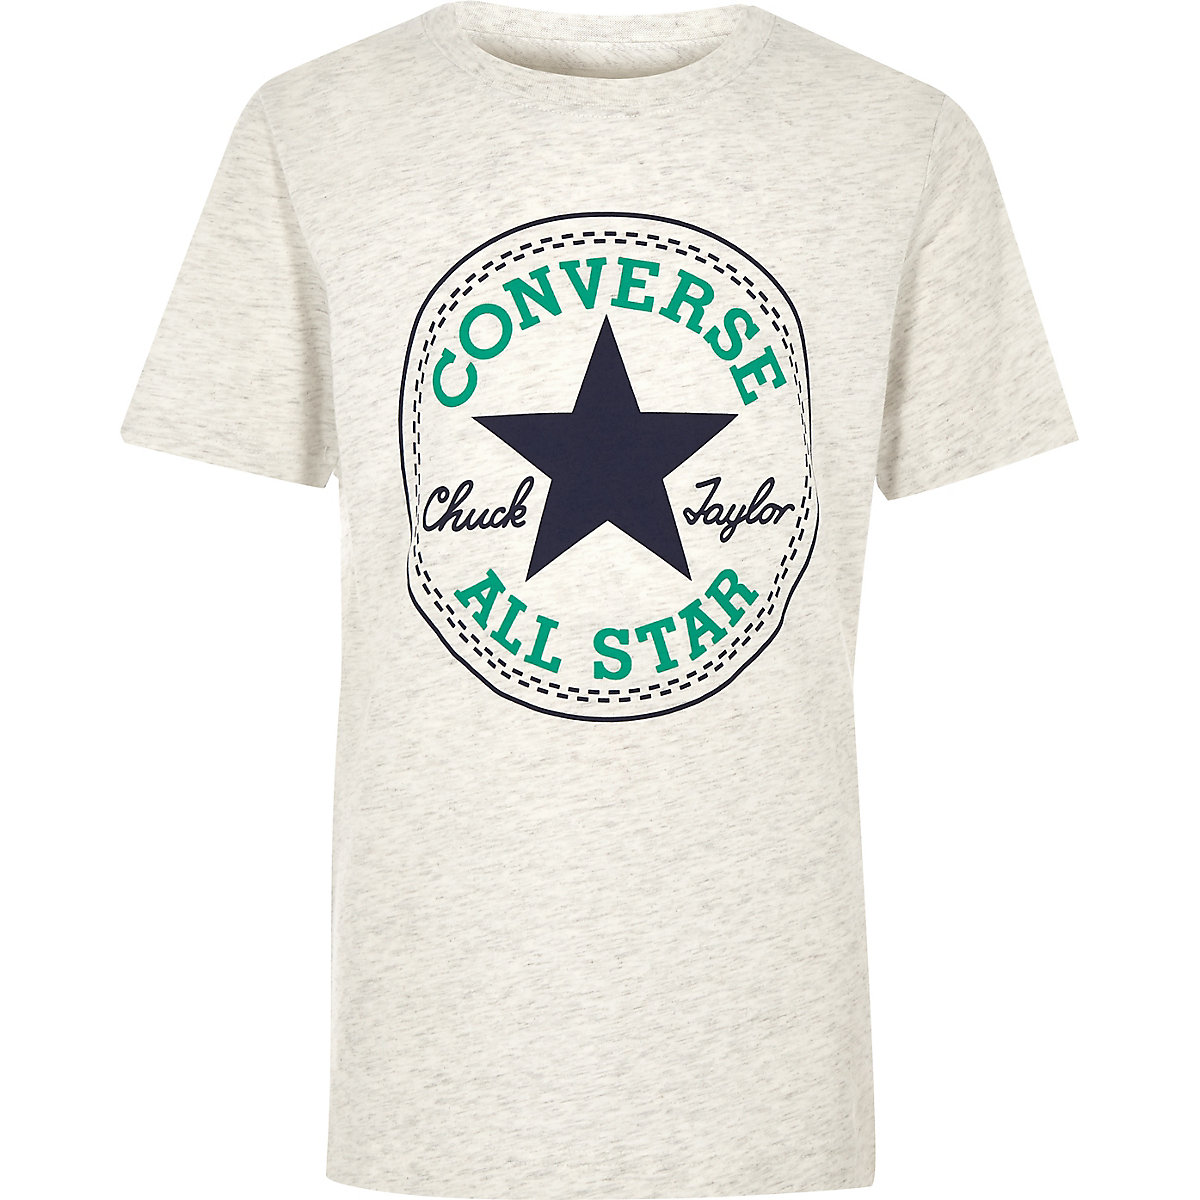 Boys white Converse logo T-shirt